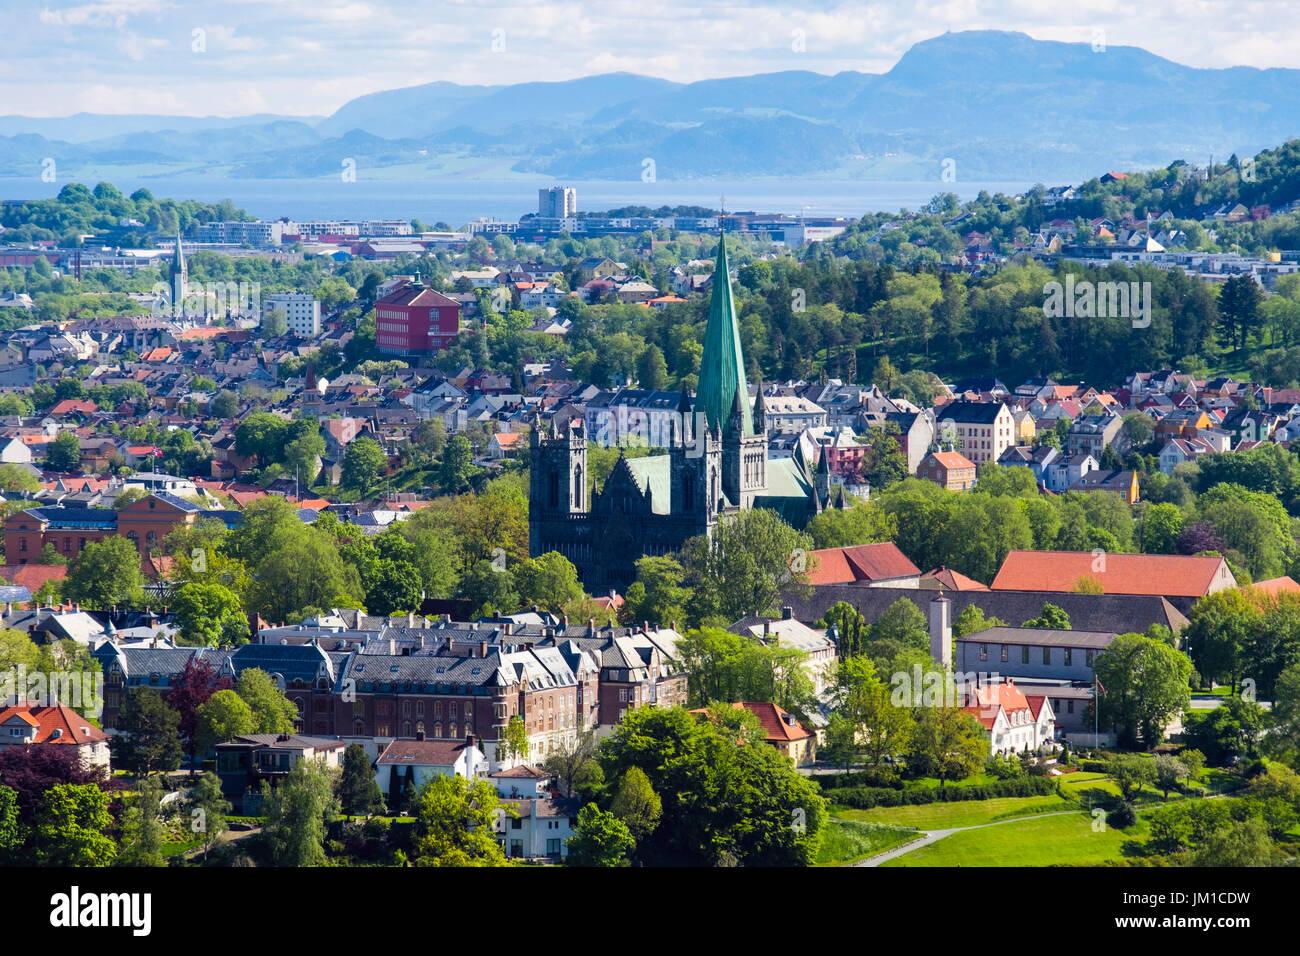 Blick auf die Altstadt mit Nidaros Kathedrale im Sommer. Trondheim, Sør-Trøndelag, Norwegen, Scandinavia Stockbild